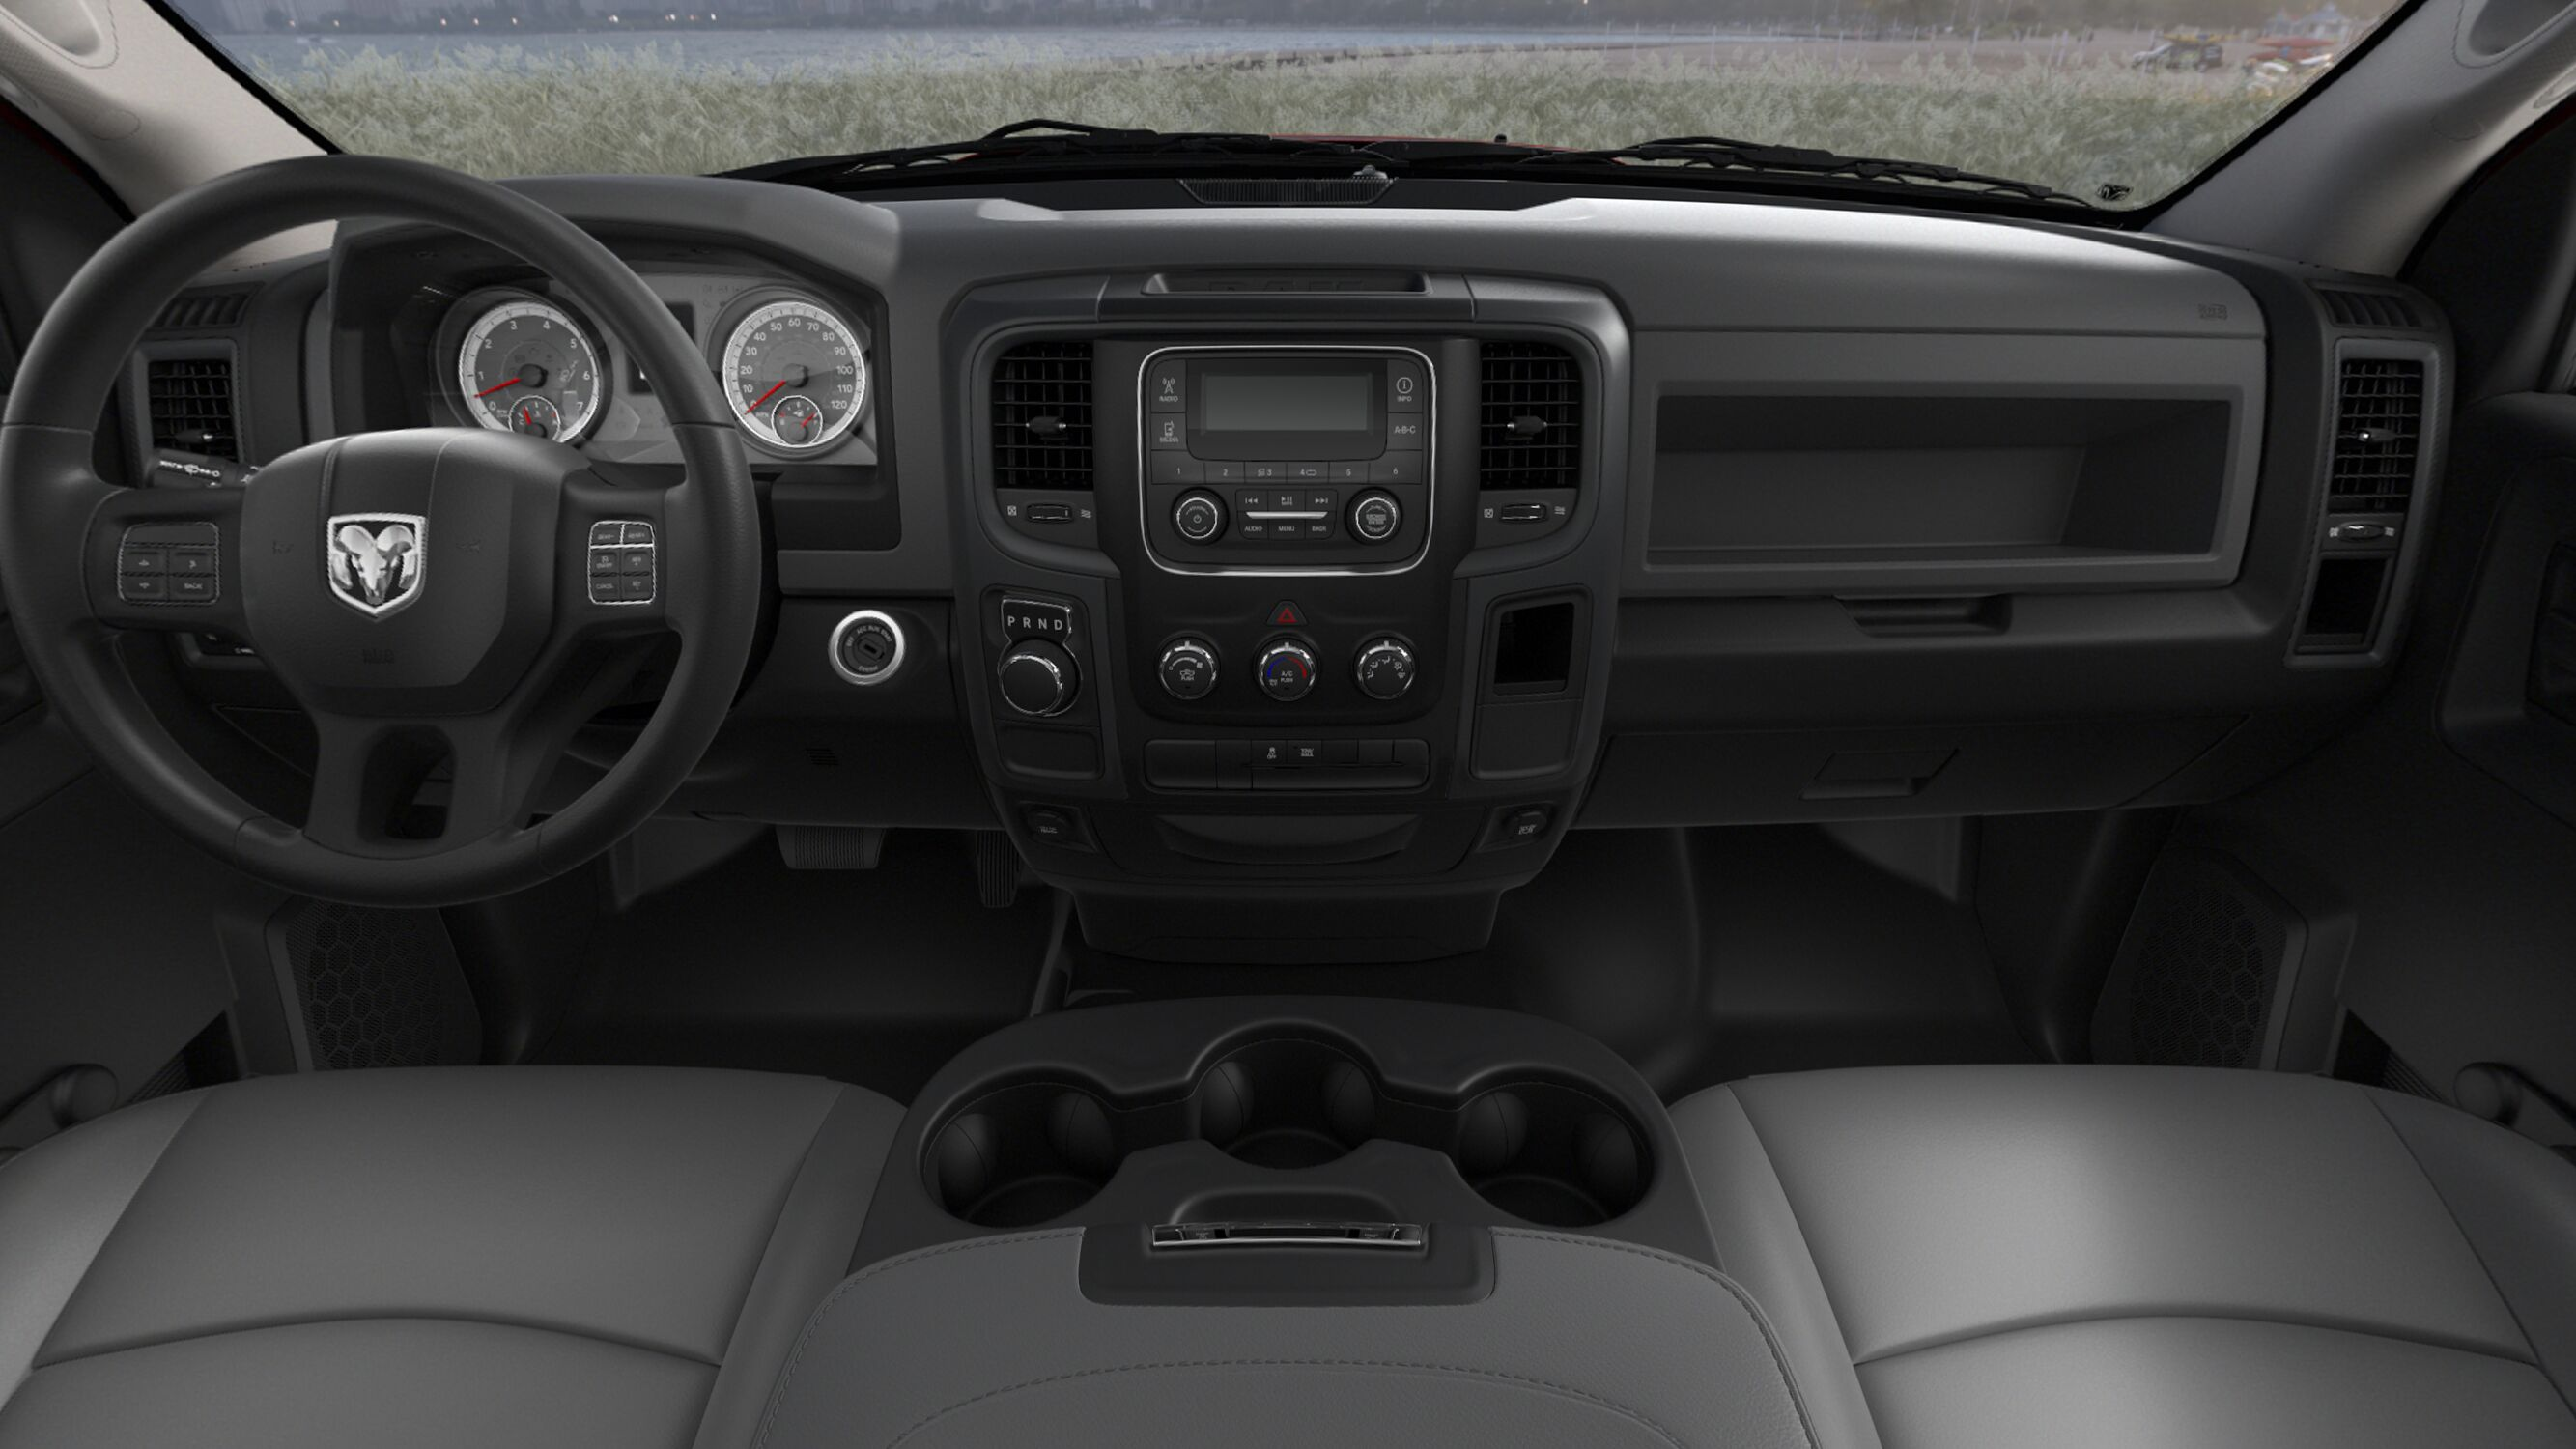 2018 Ram Tradesman 1500 interior